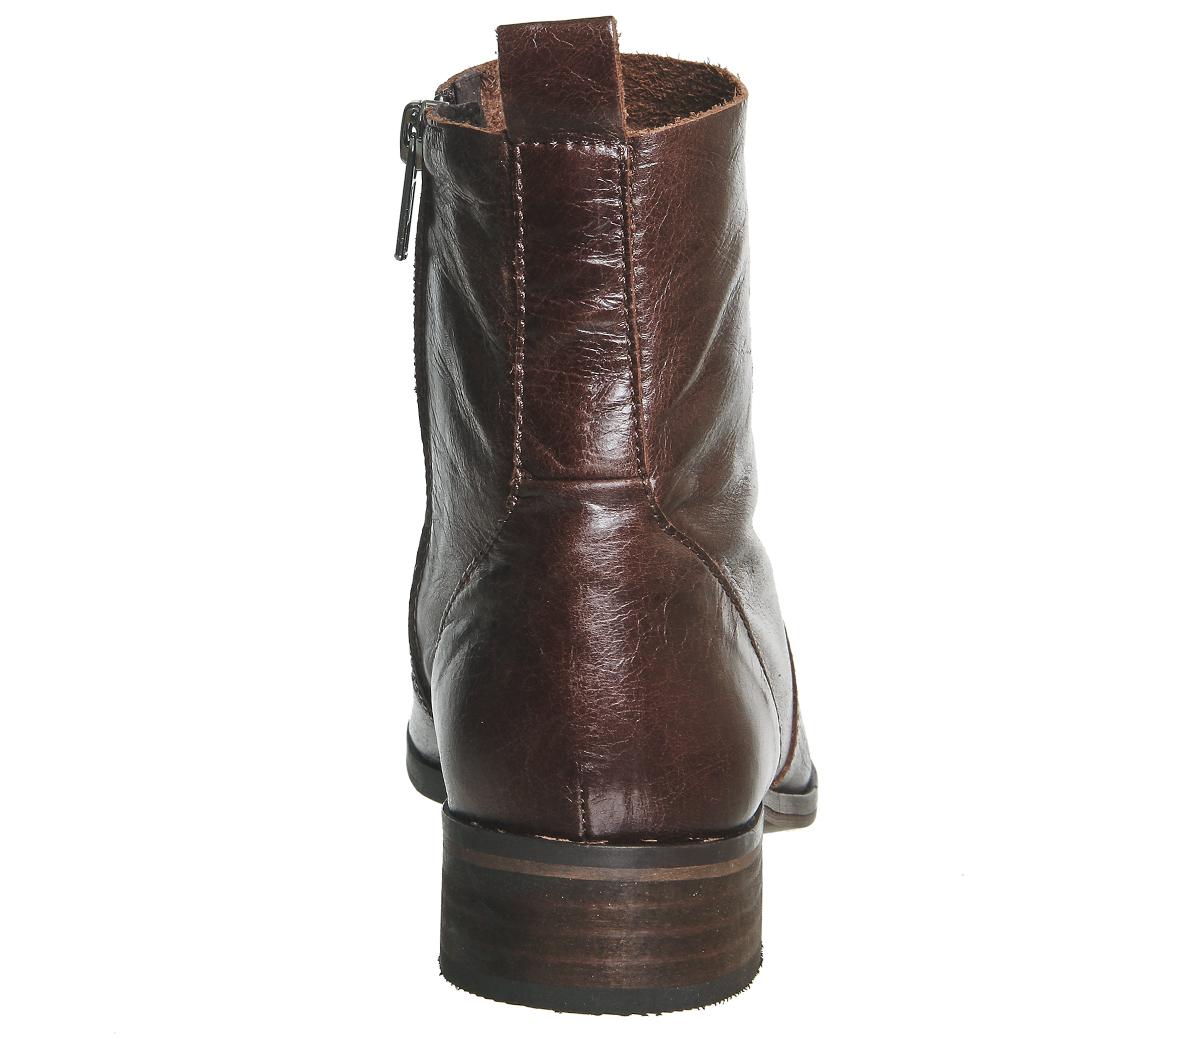 Damenschuhe Stiefel Office Ashleigh Flat Ankle Stiefel Damenschuhe BROWN LEATHER Stiefel 6681e7